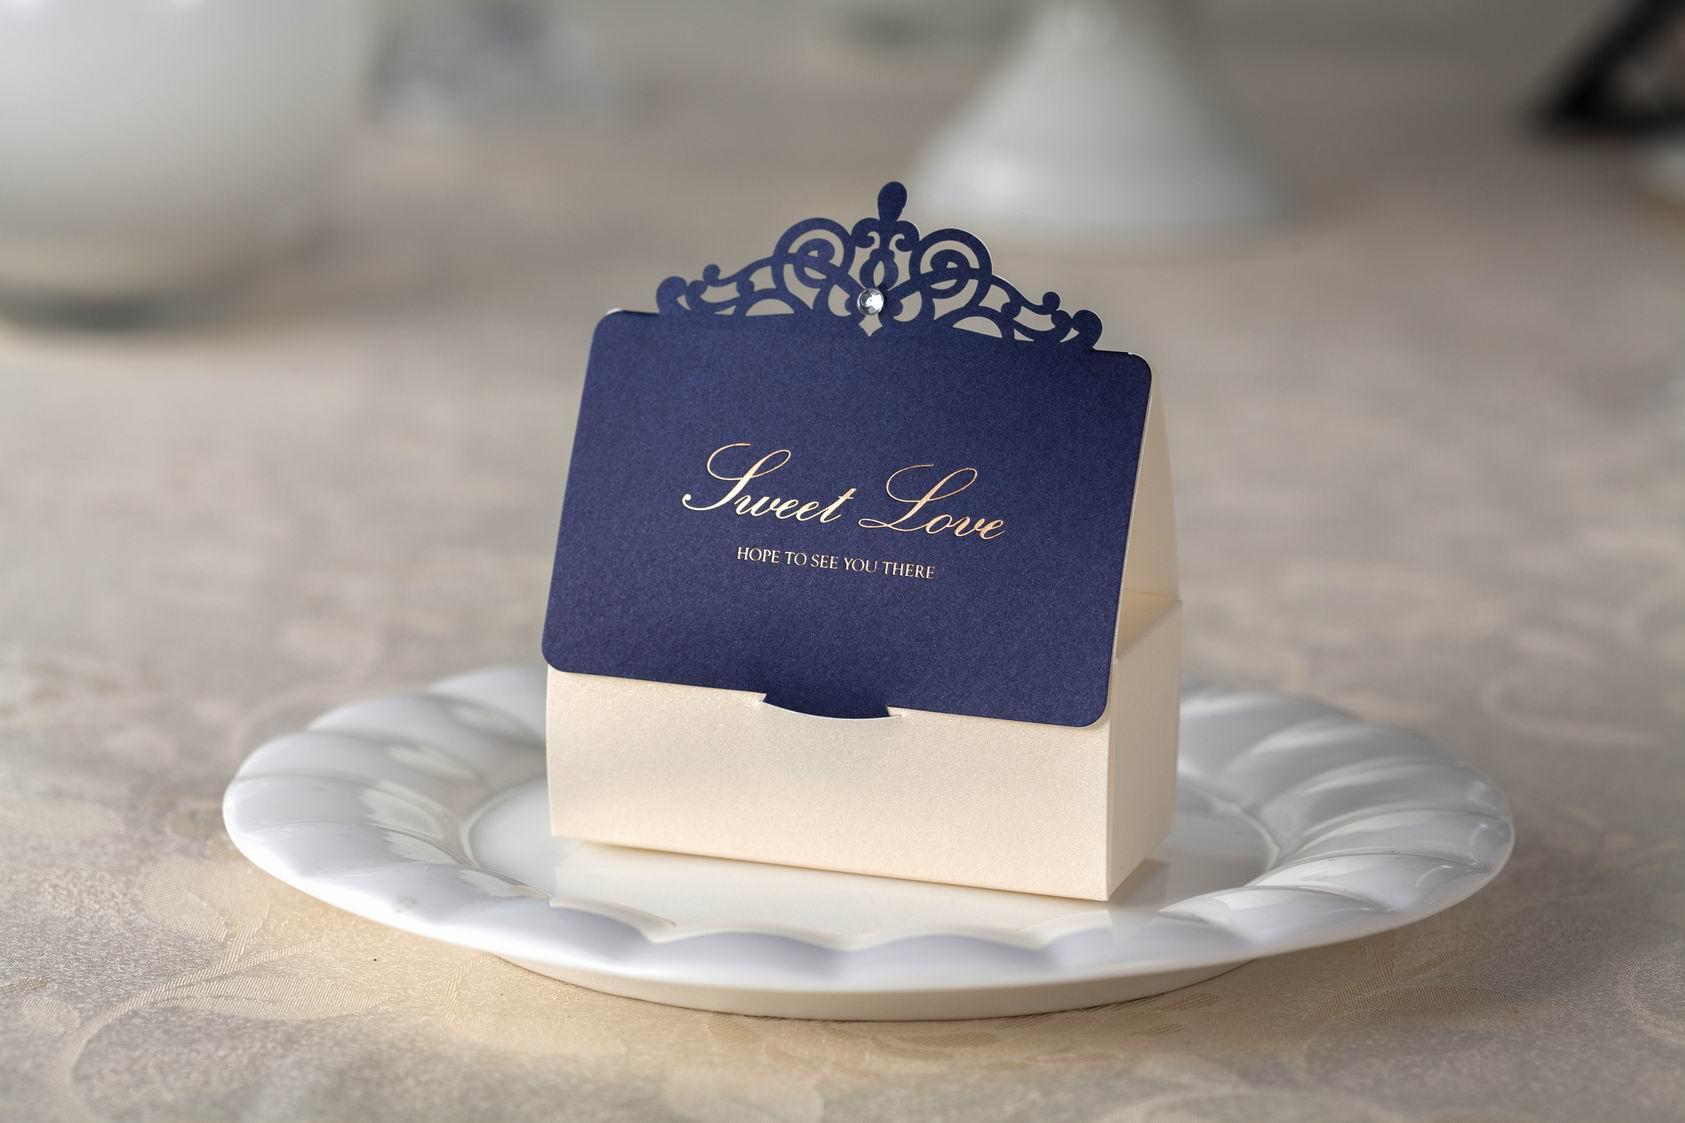 Wedding Favor Boxes Trinidad : Wedding favors boxes gift candy box blue party favor